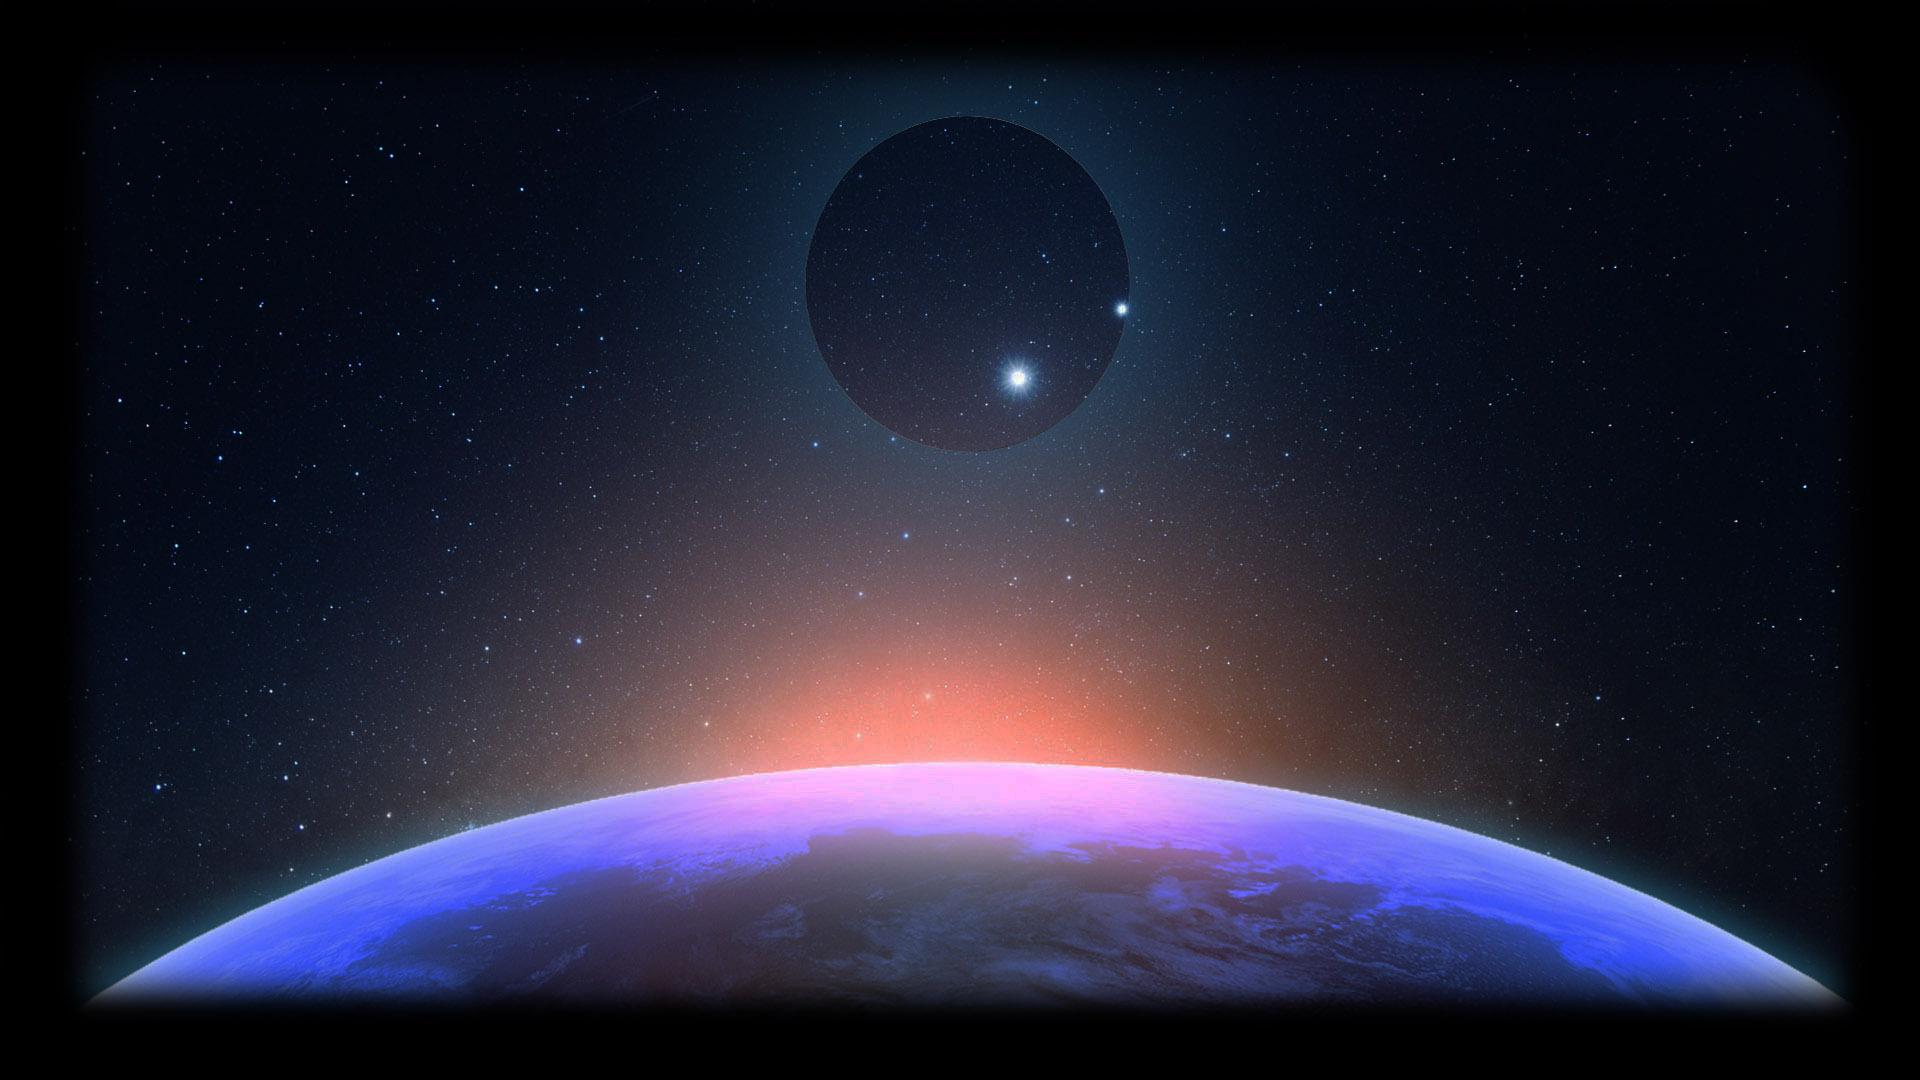 434610-AboveThePlanet